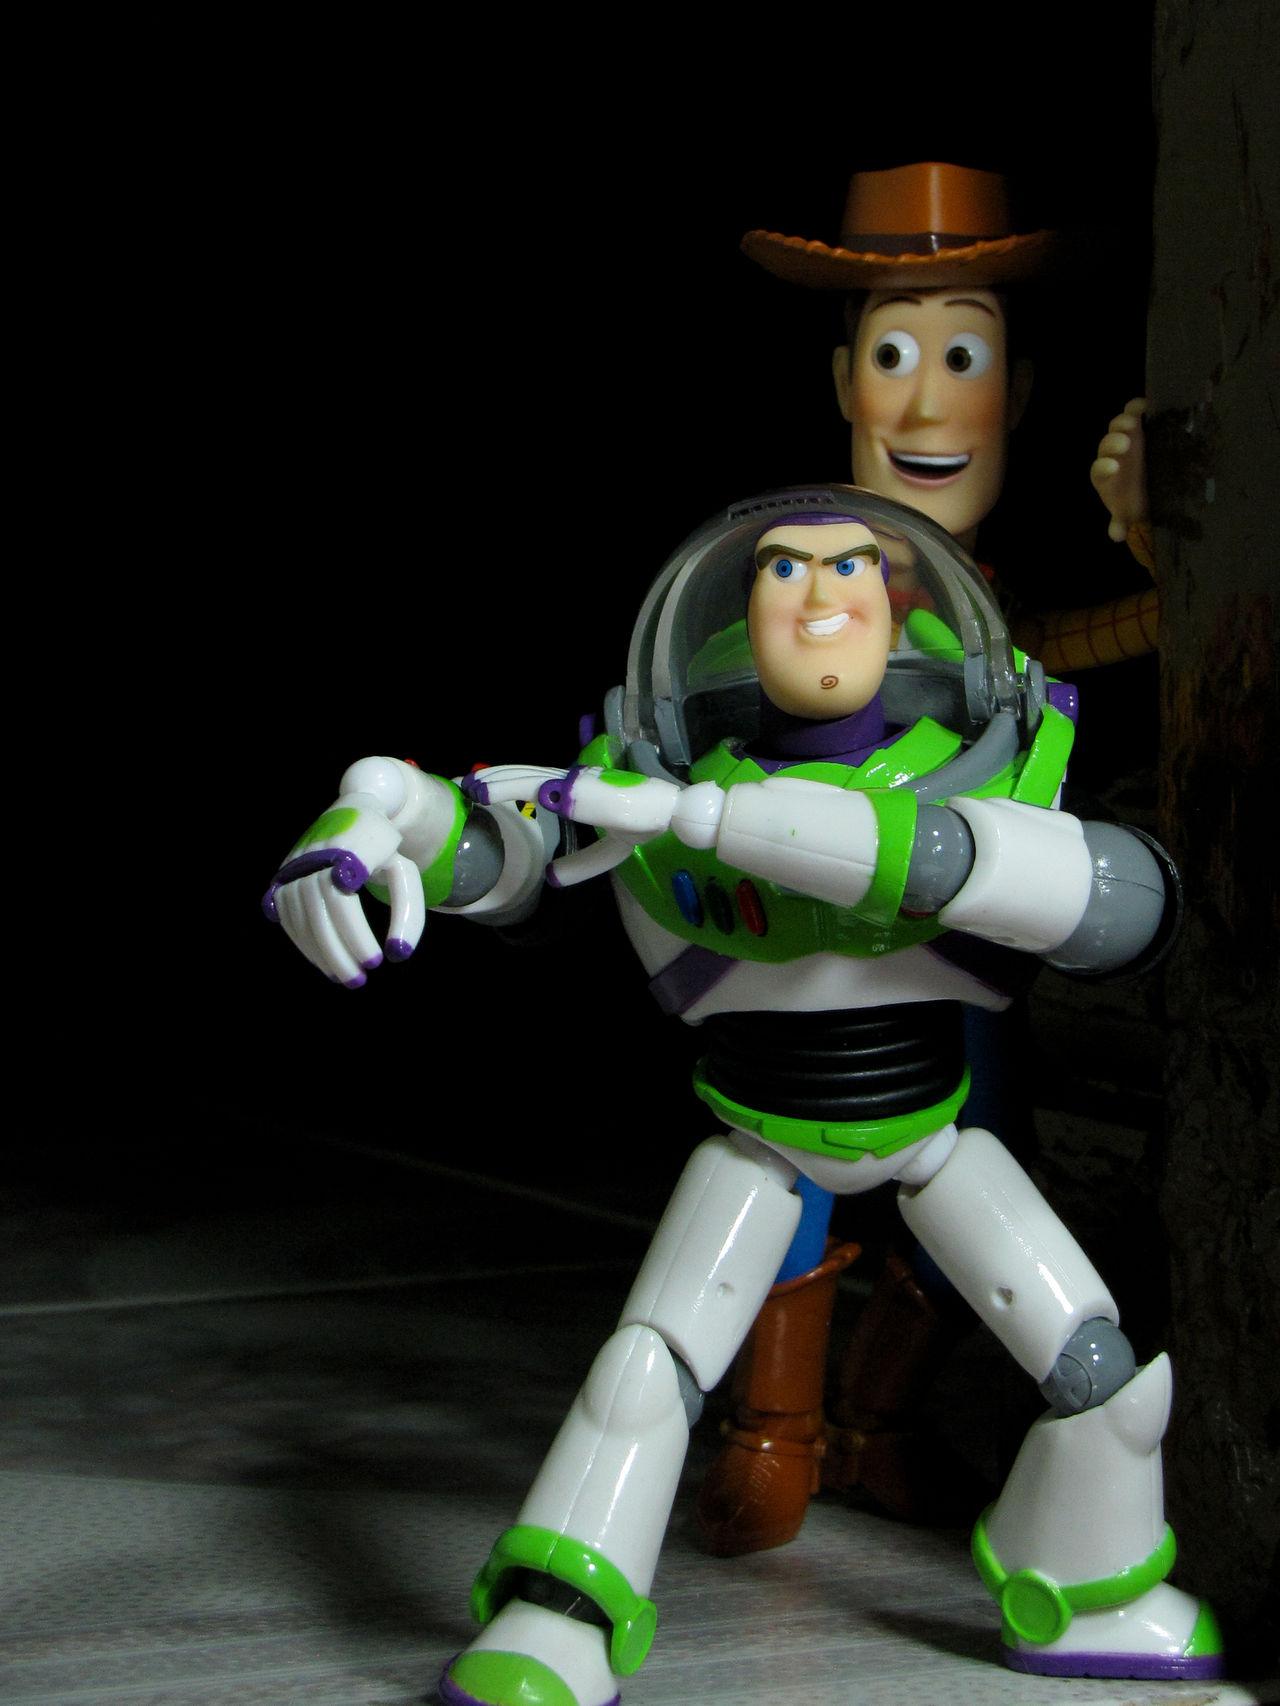 Animation Black Background Buzzlightyear MOVIE Revoltech Toy Toyphotography Toystory Woody